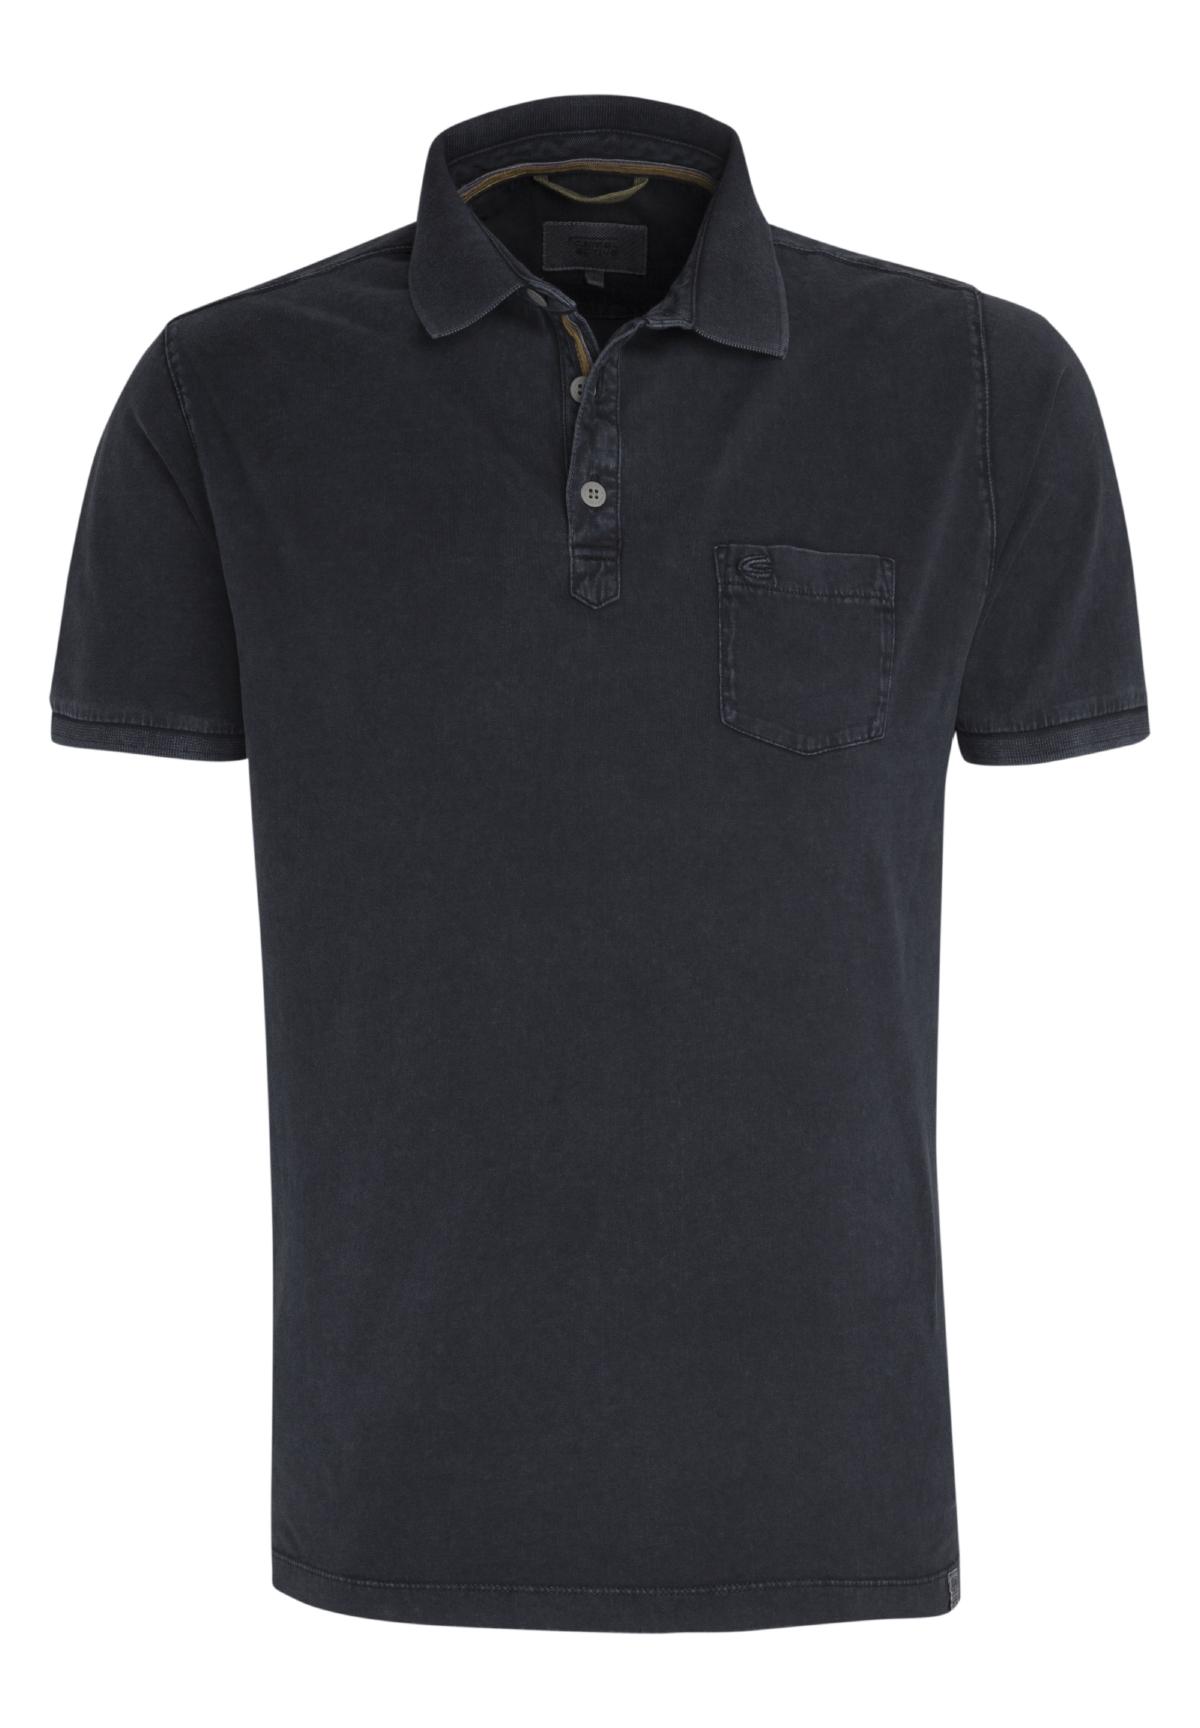 Camel-Active-Herren-Shirt-Poloshirt-Pique-Regular-Fit-NEU Indexbild 42